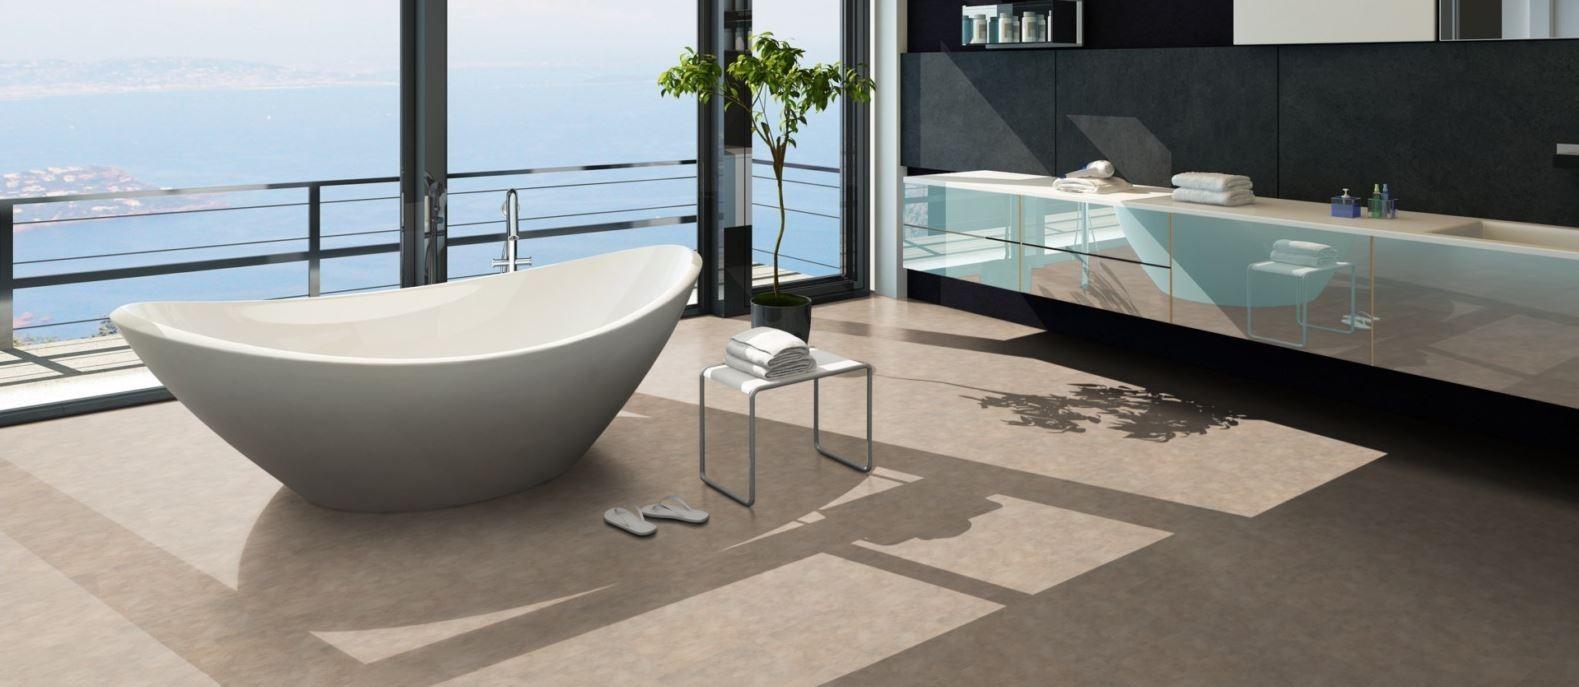 klick vinyl fliesen stone latium ns 0 5 mm nk 33 42. Black Bedroom Furniture Sets. Home Design Ideas